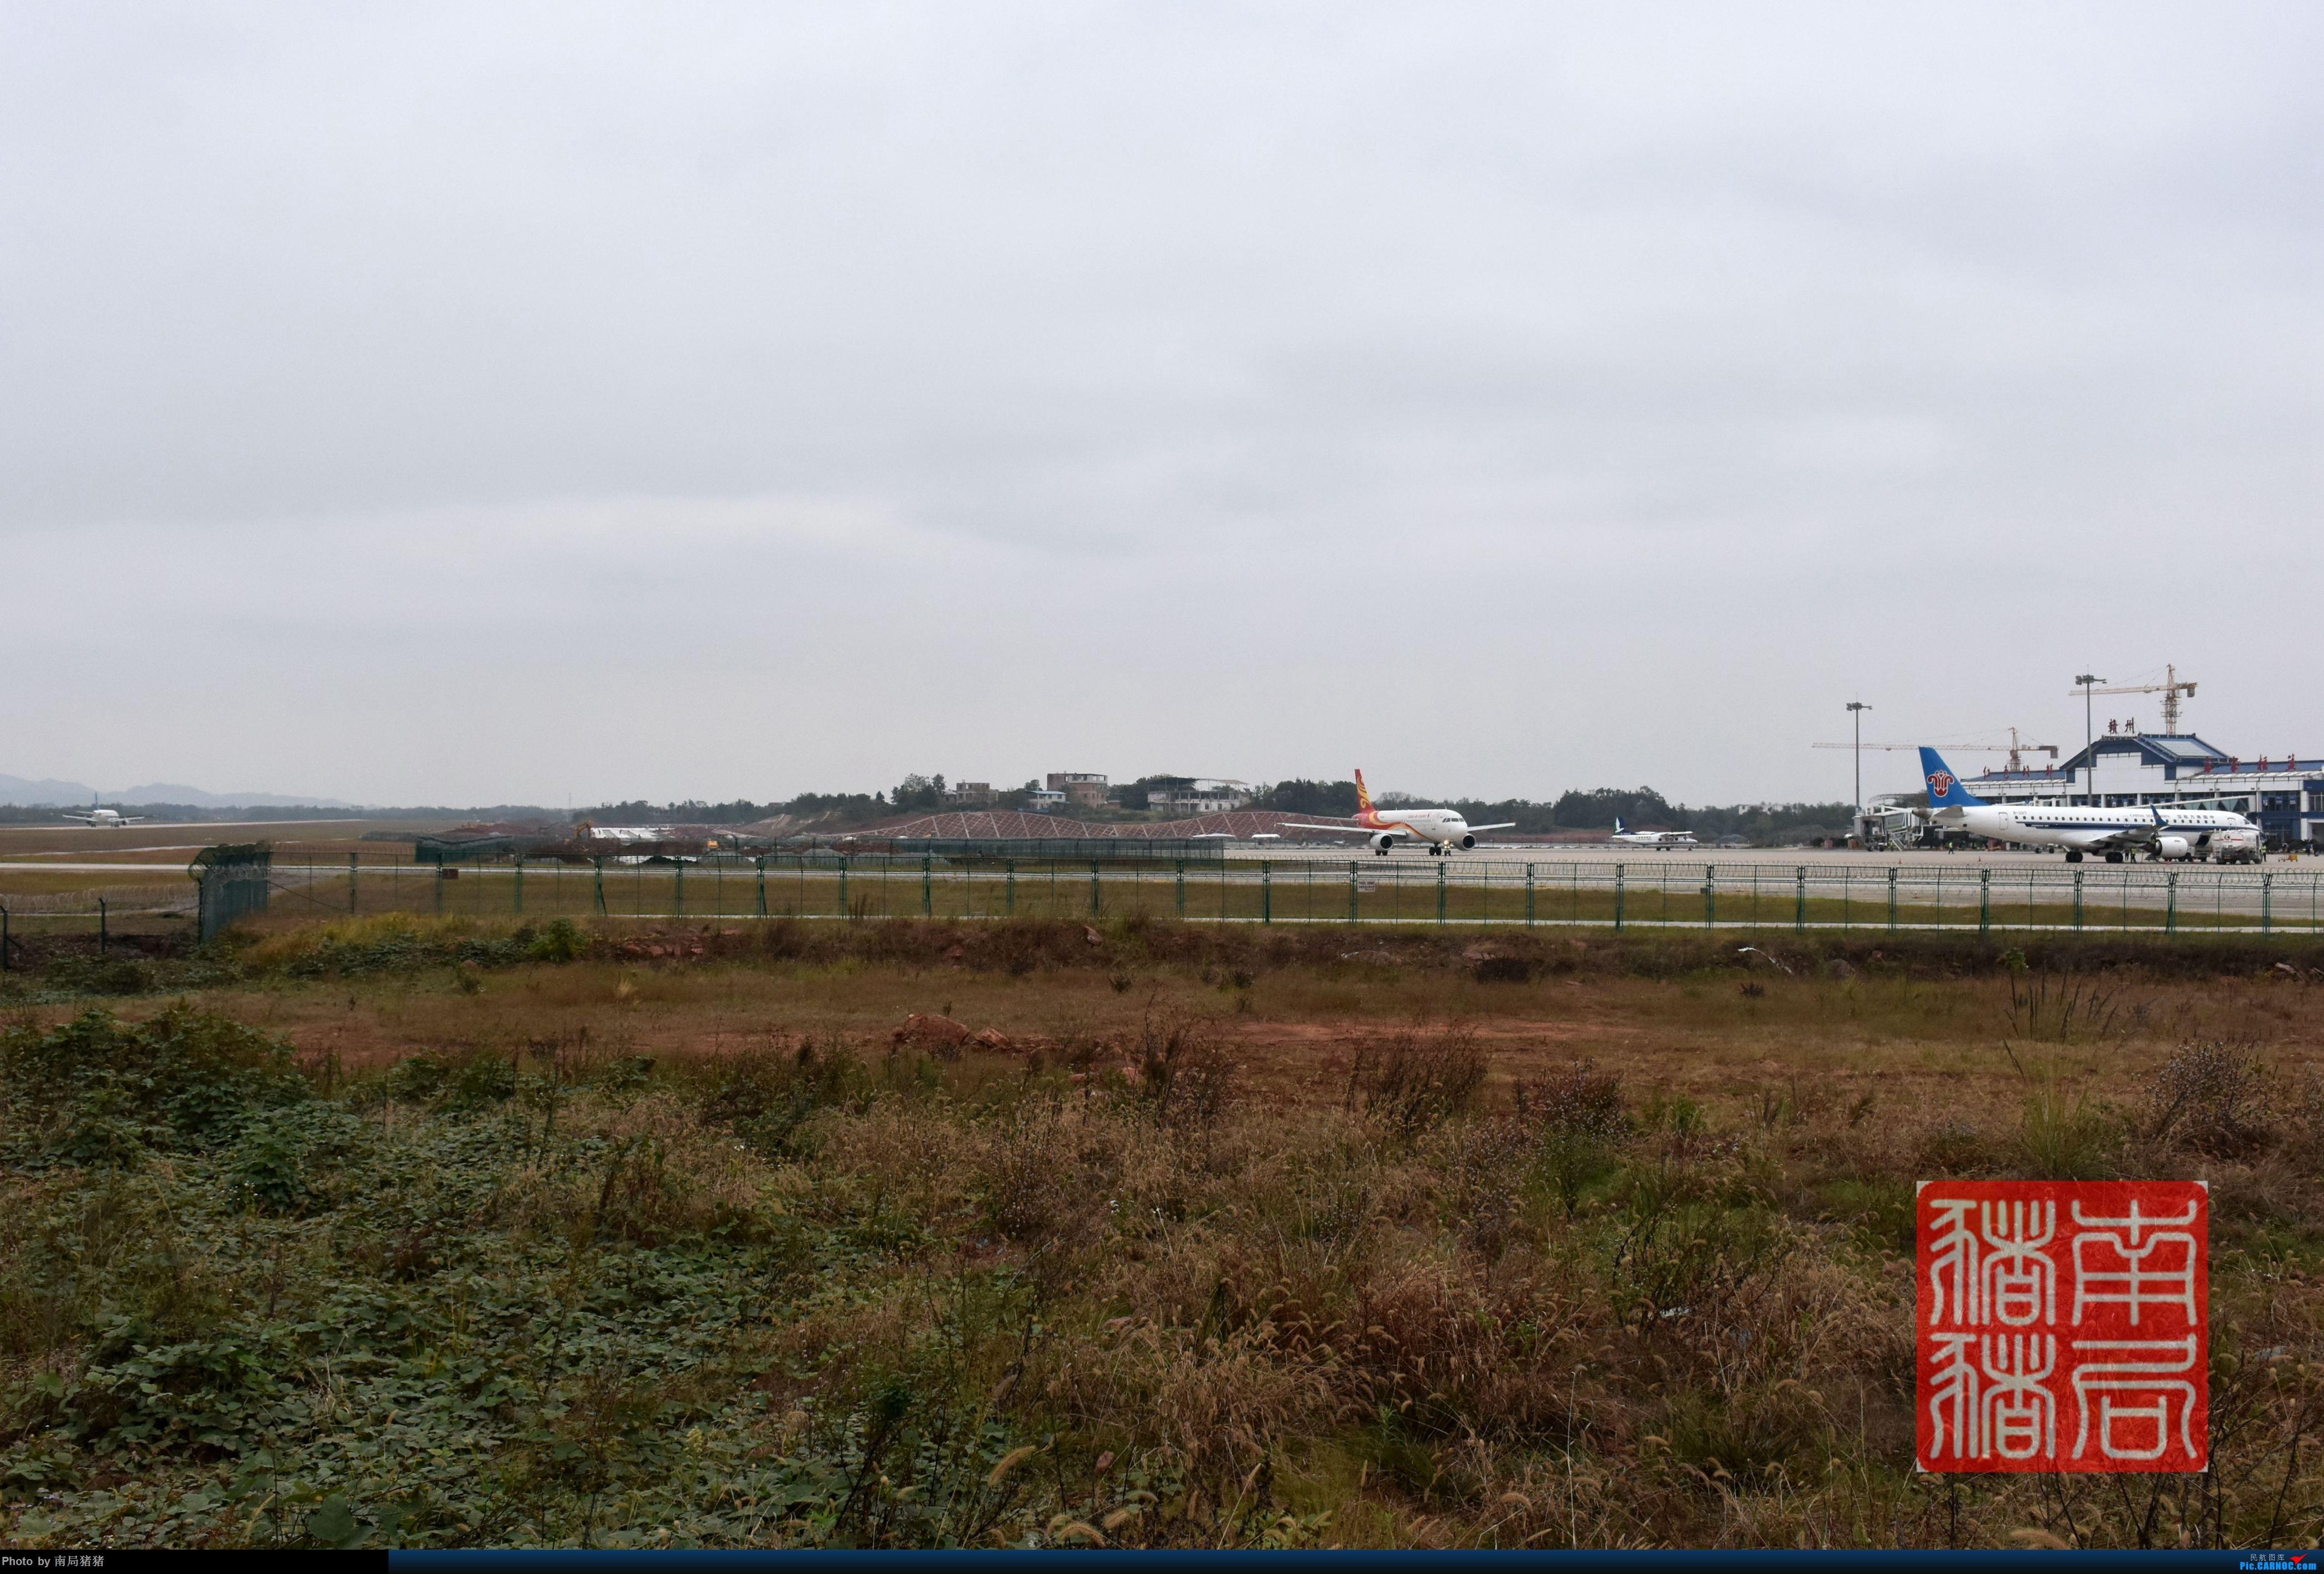 Re:[原创]KOW赣州黄金机场(通航运12,北部湾变形金刚) AIRBUS A320-200 B-9959 中国赣州黄金机场